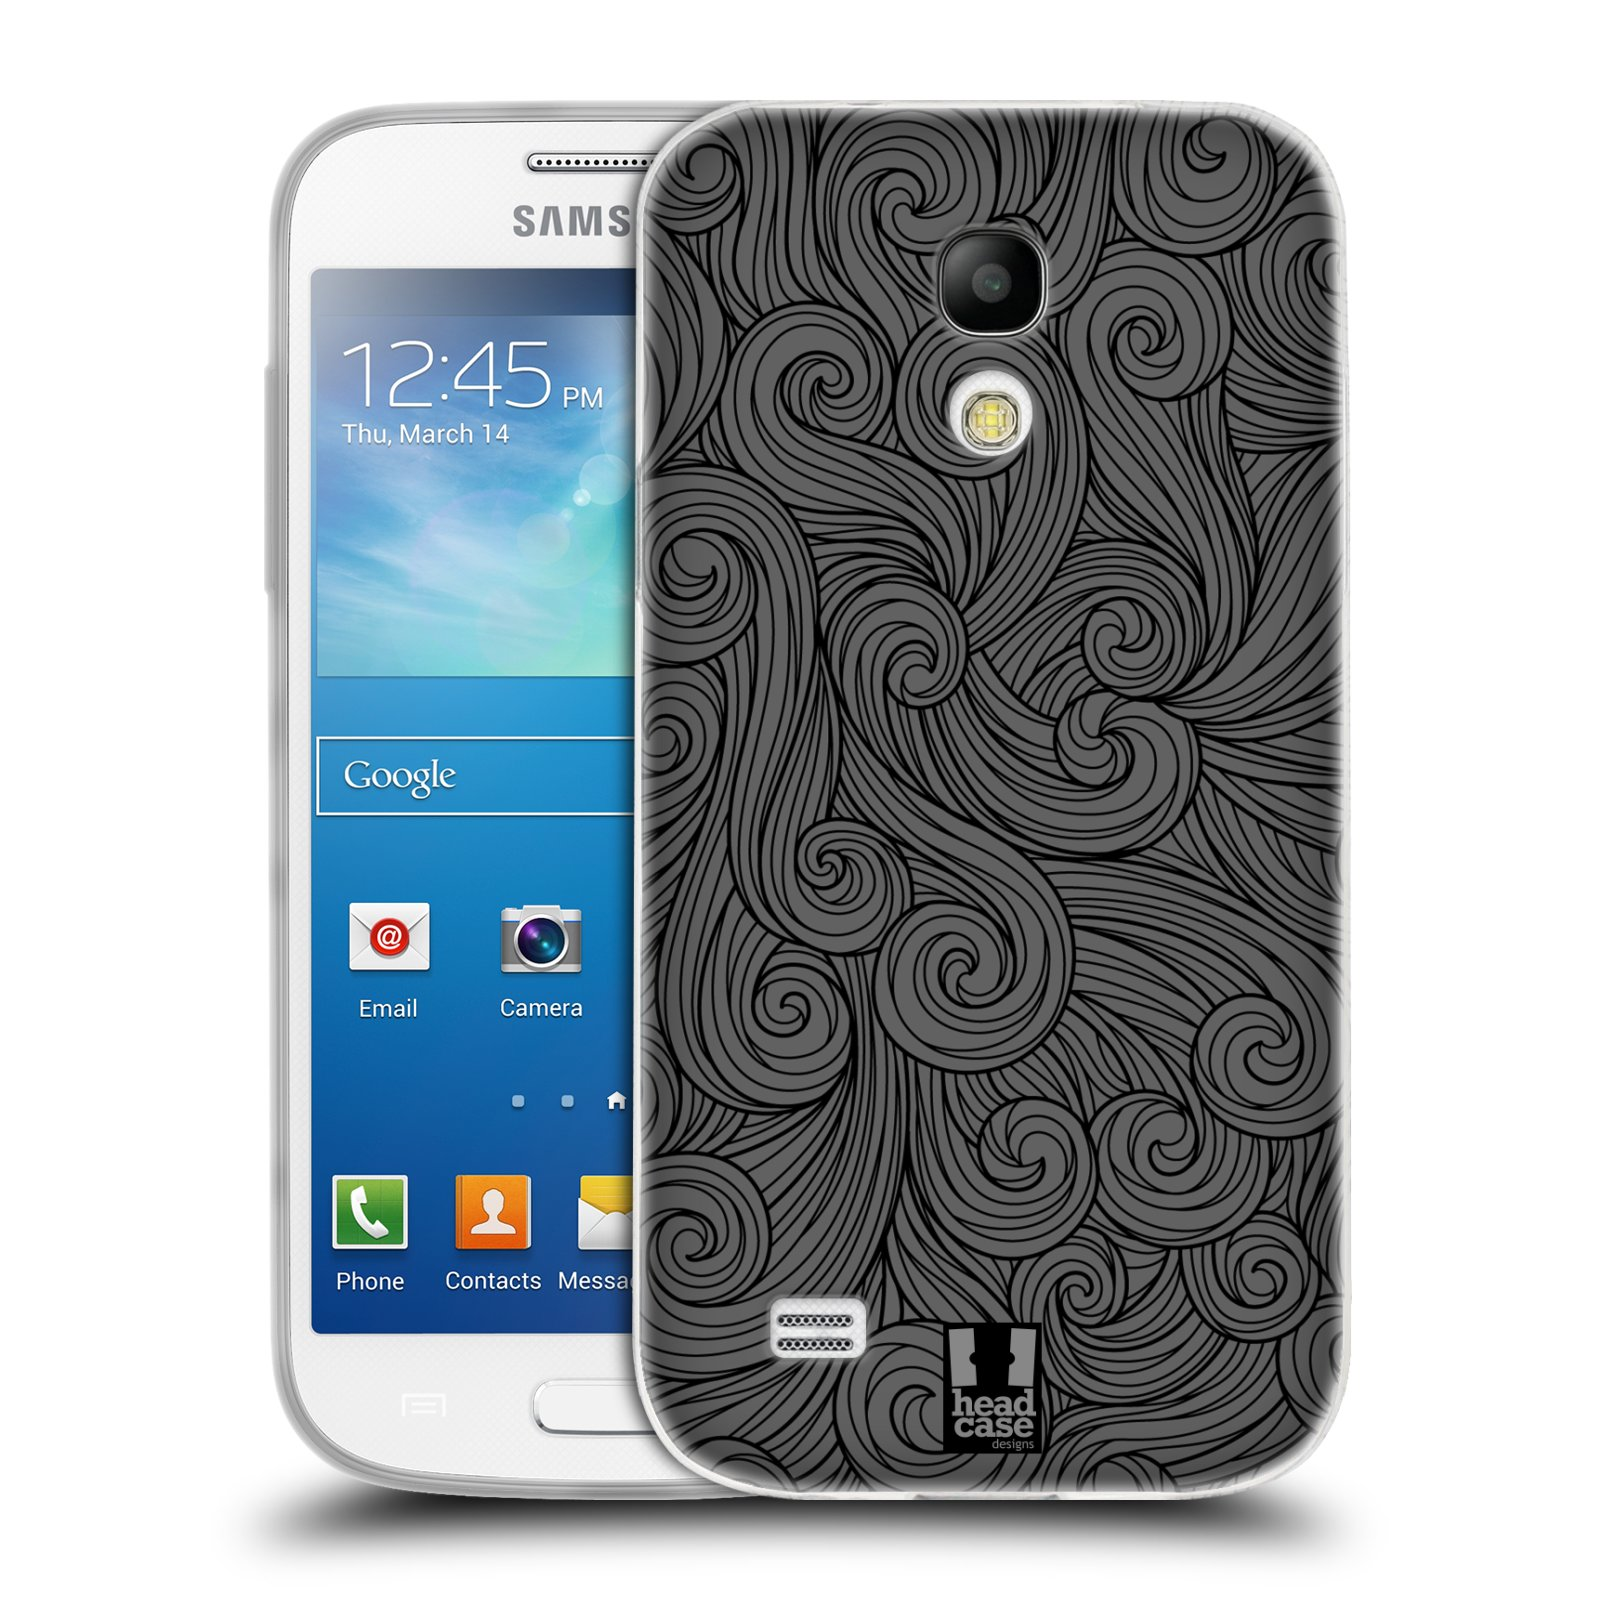 Silikonové pouzdro na mobil Samsung Galaxy S4 Mini HEAD CASE Dark Grey Swirls (Silikonový kryt či obal na mobilní telefon Samsung Galaxy S4 Mini GT-i9195 / i9190)